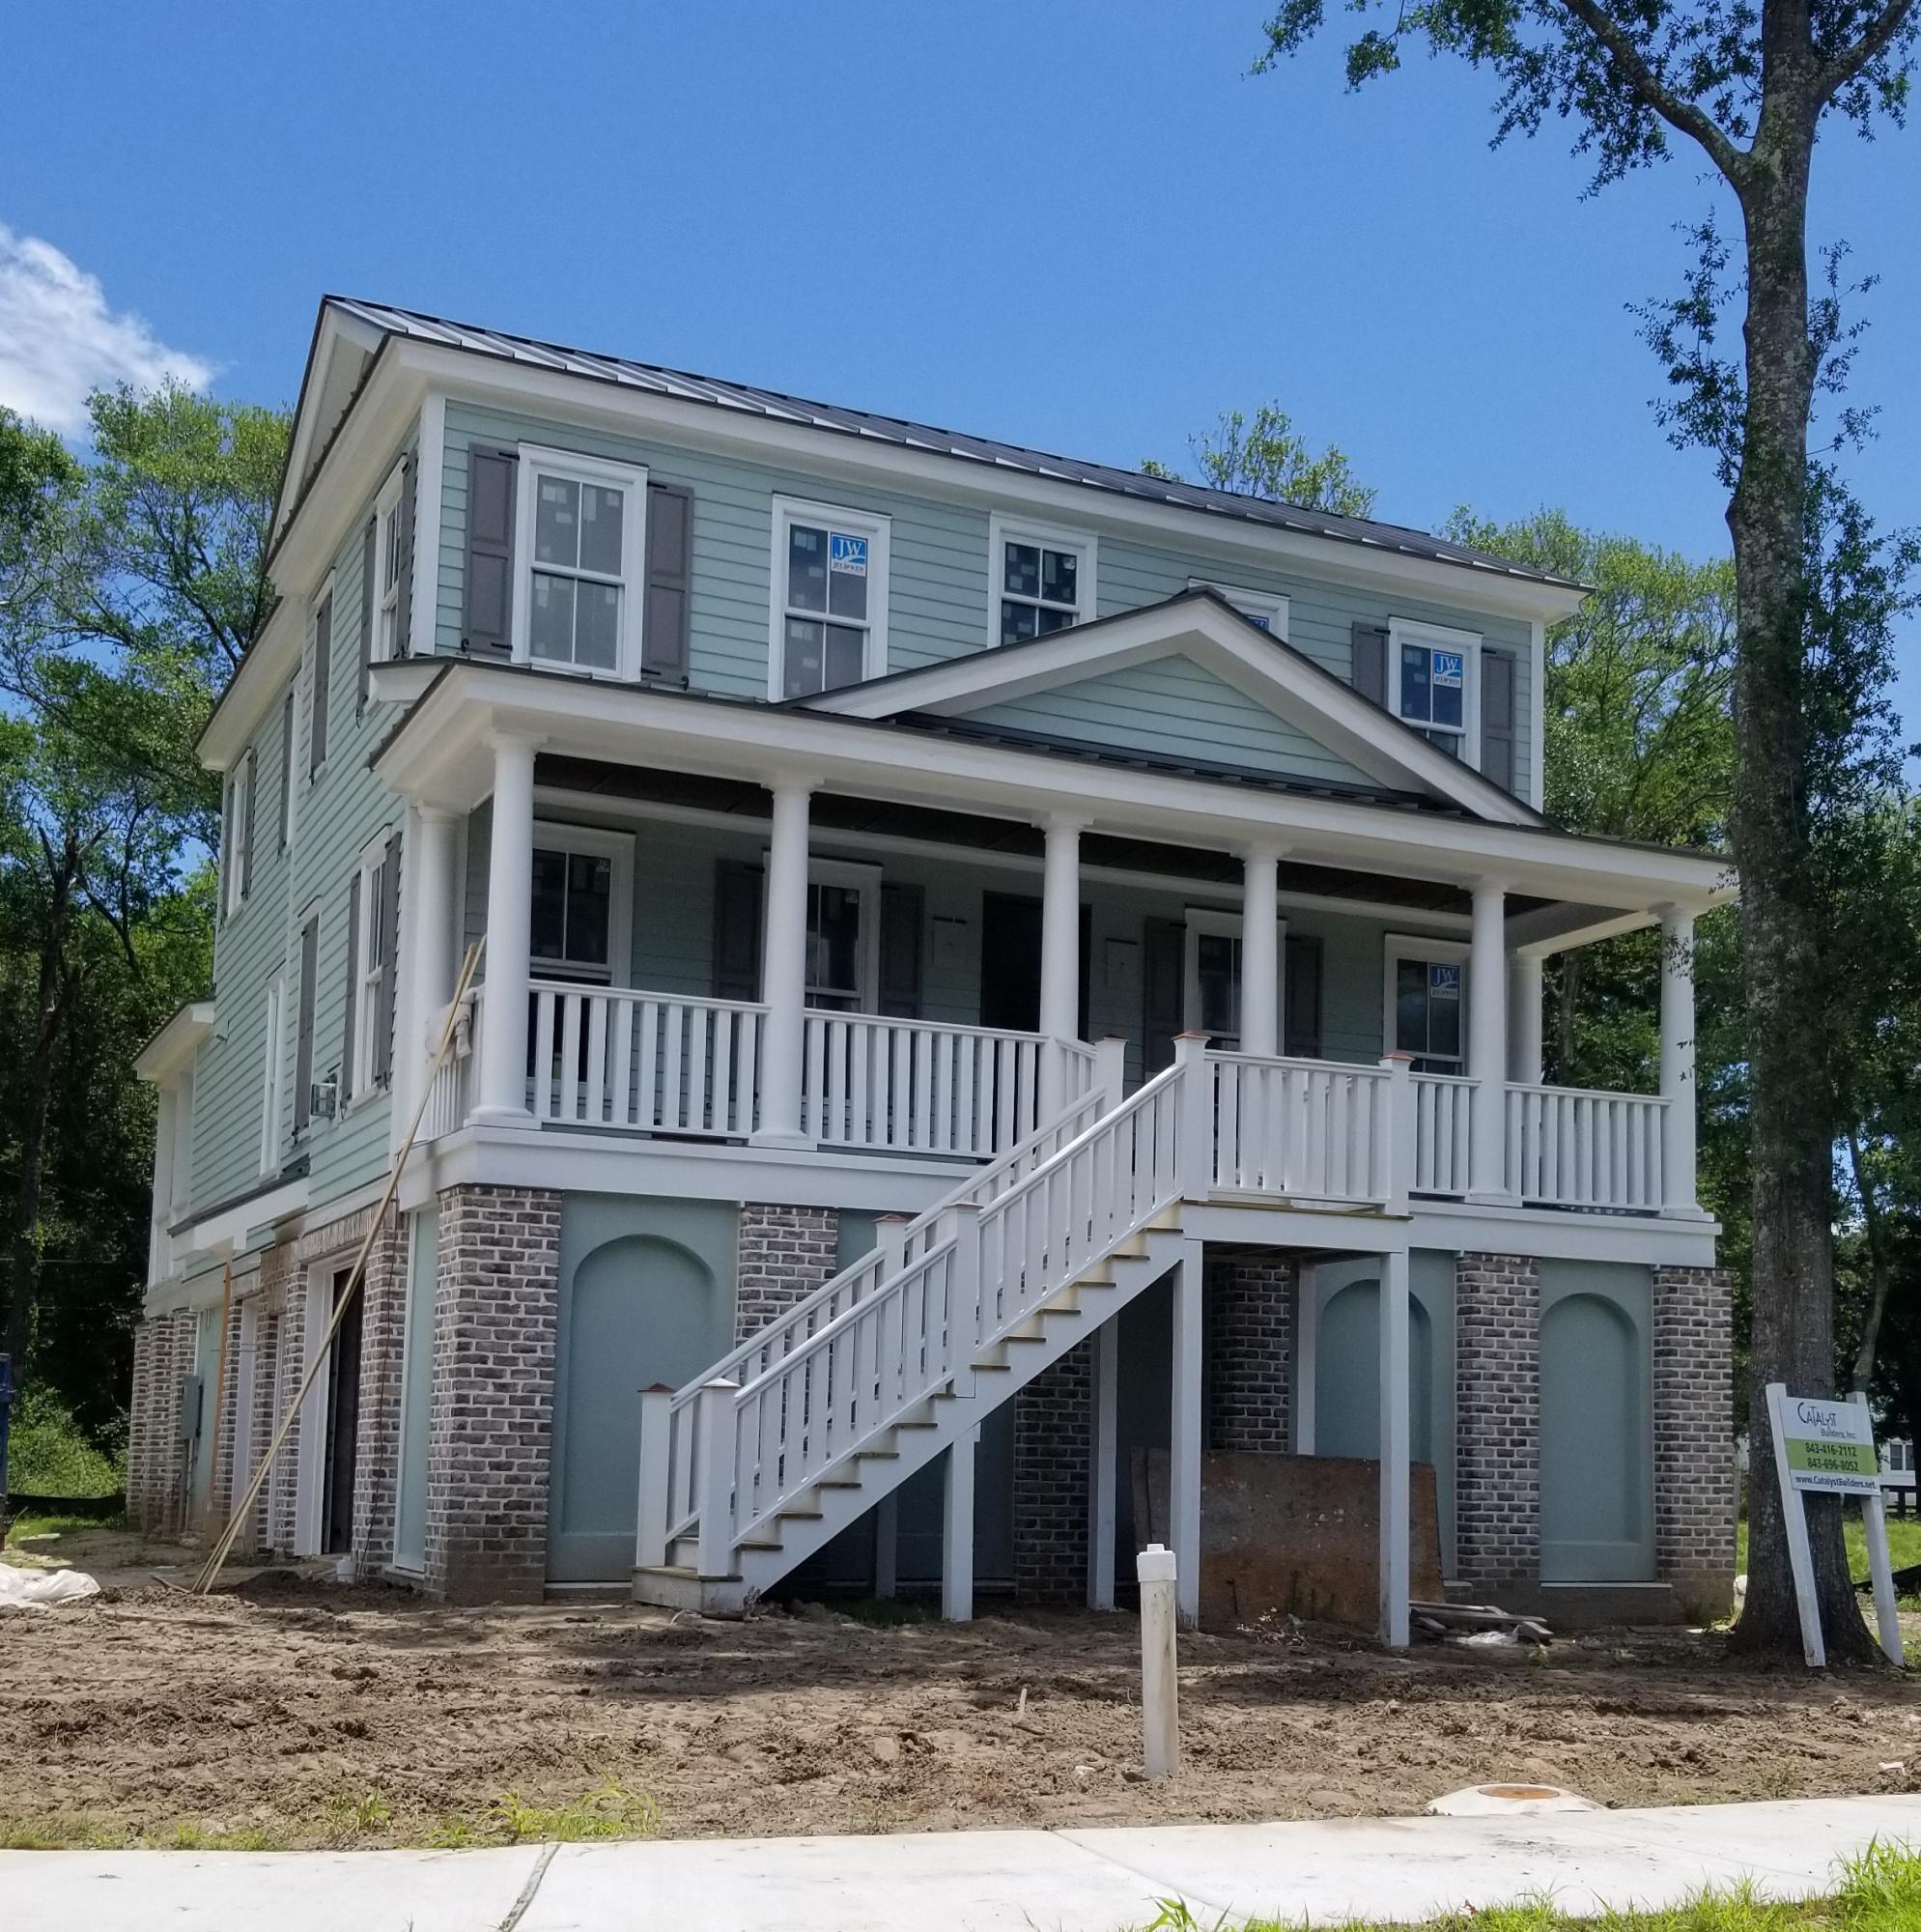 Mathis Ferry Court Homes For Sale - 1212 Clonmel, Mount Pleasant, SC - 0